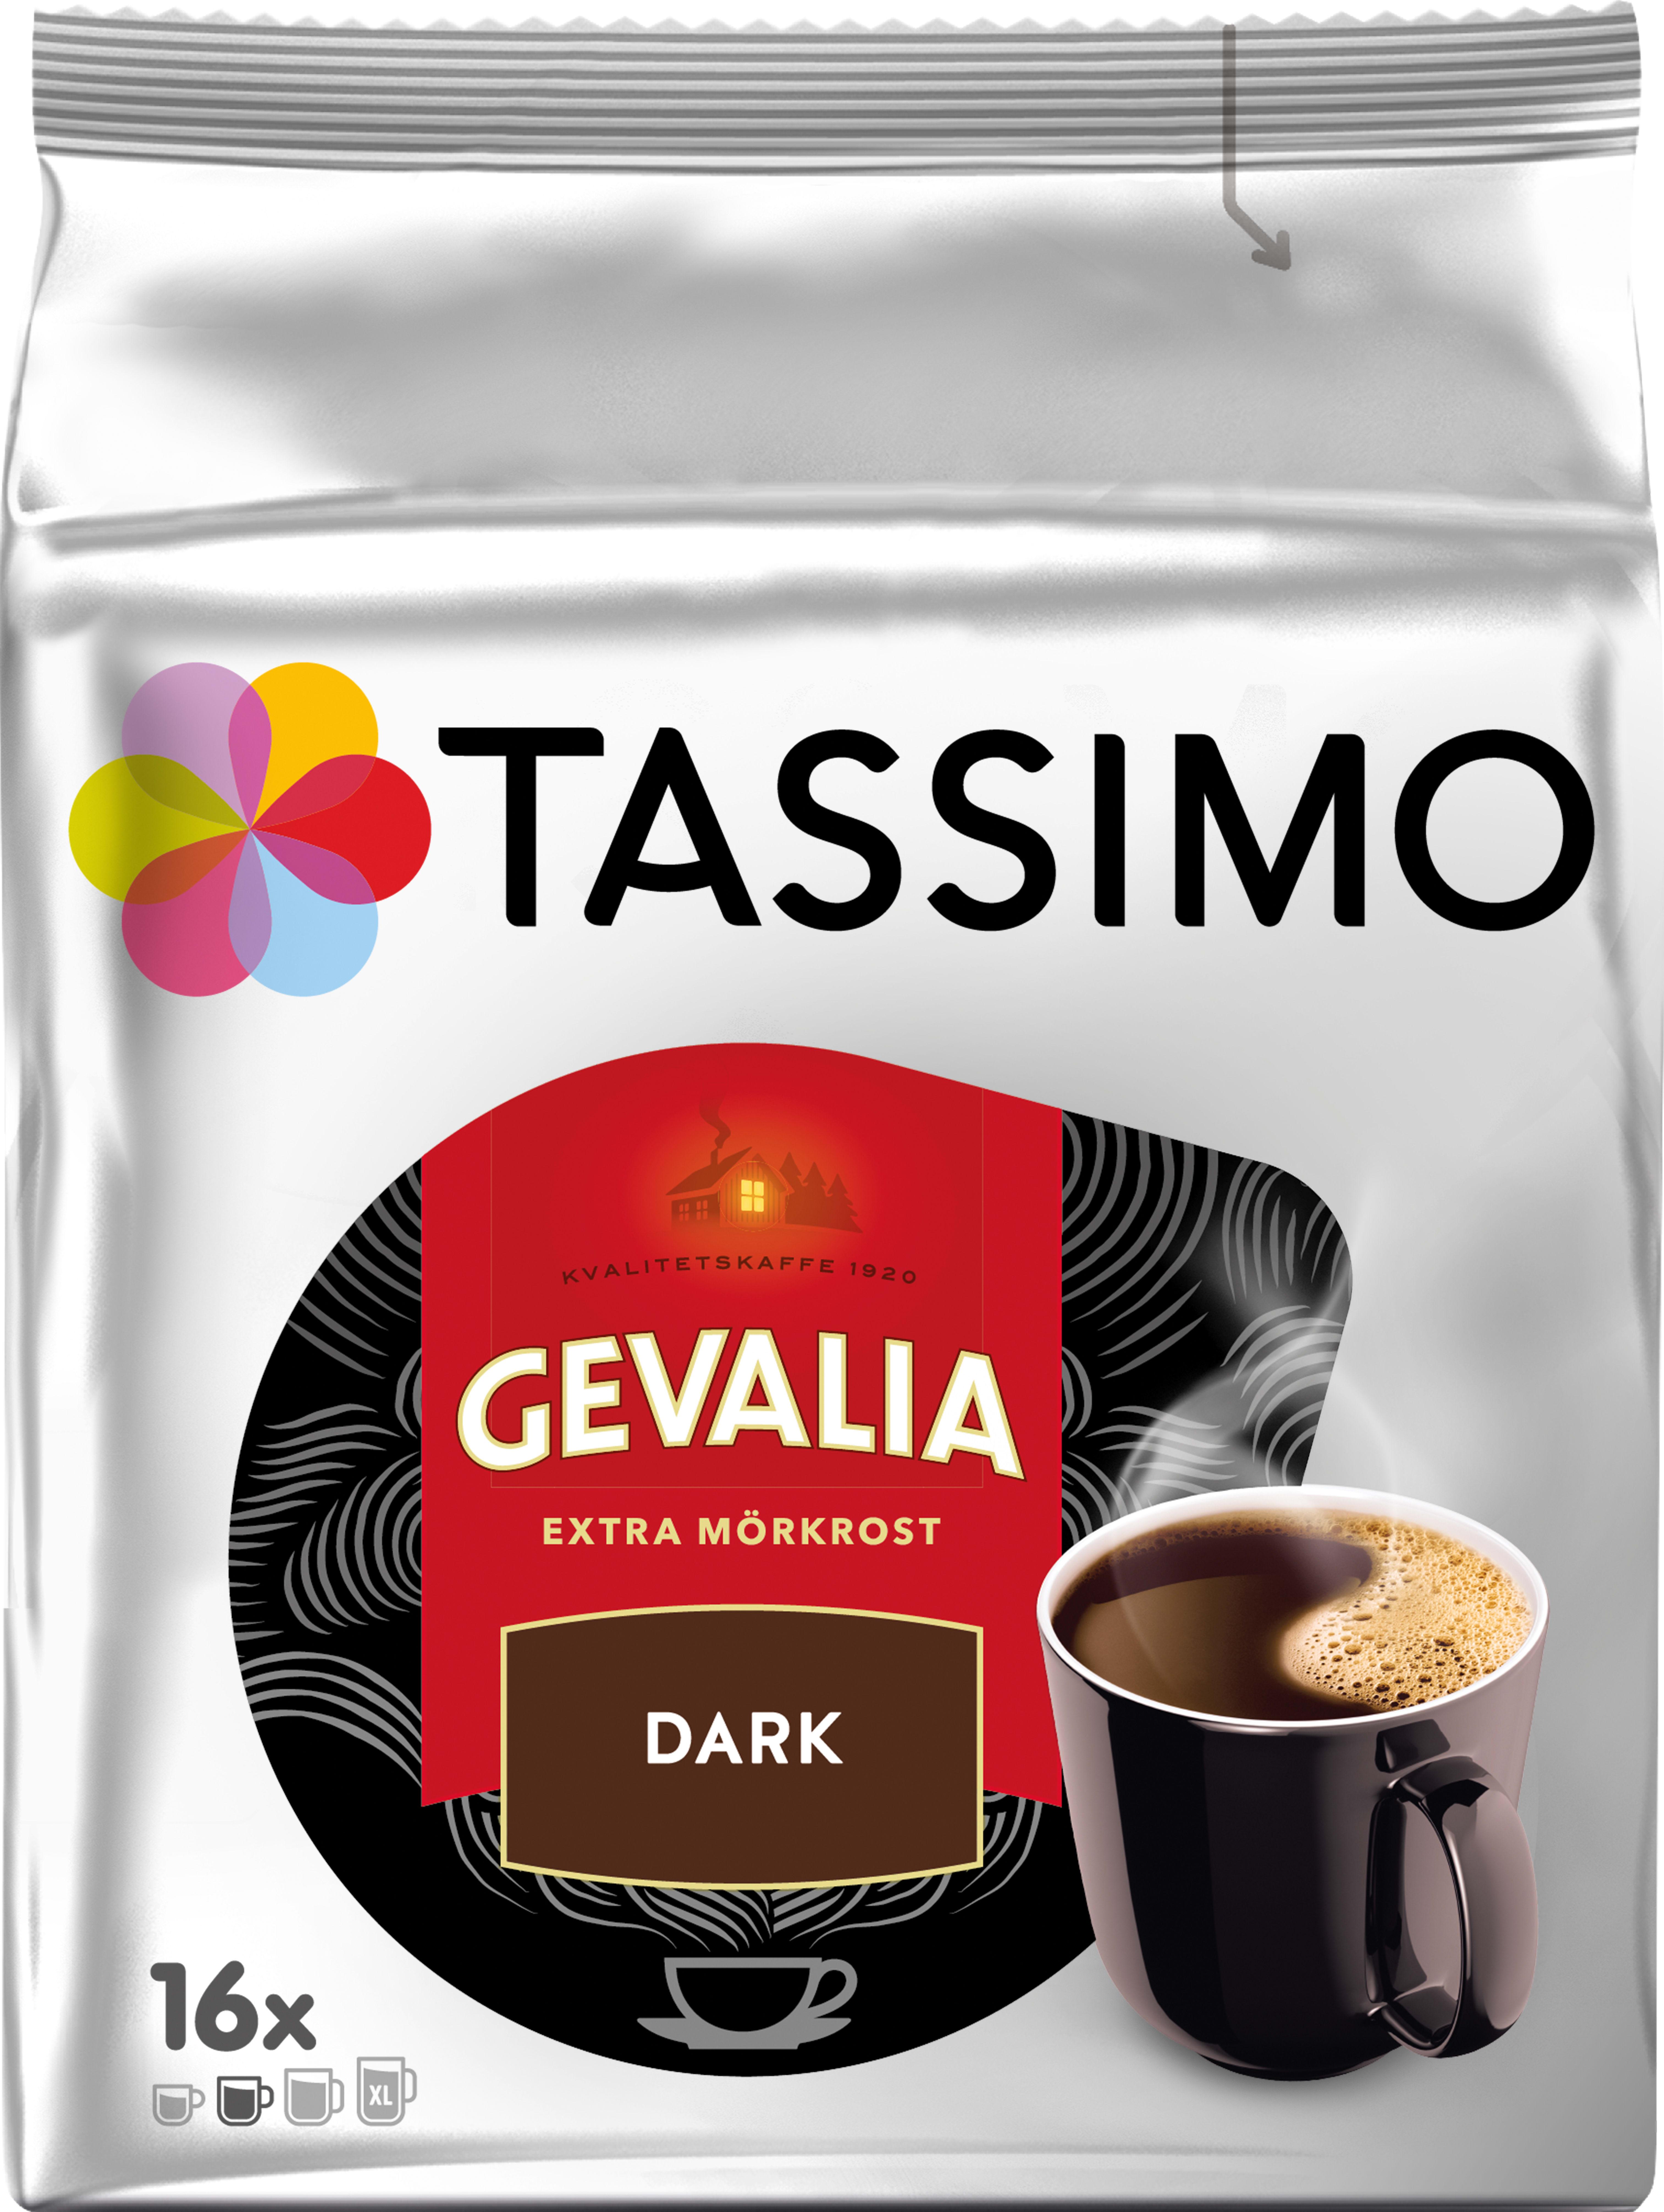 martello kaffekapslar ica